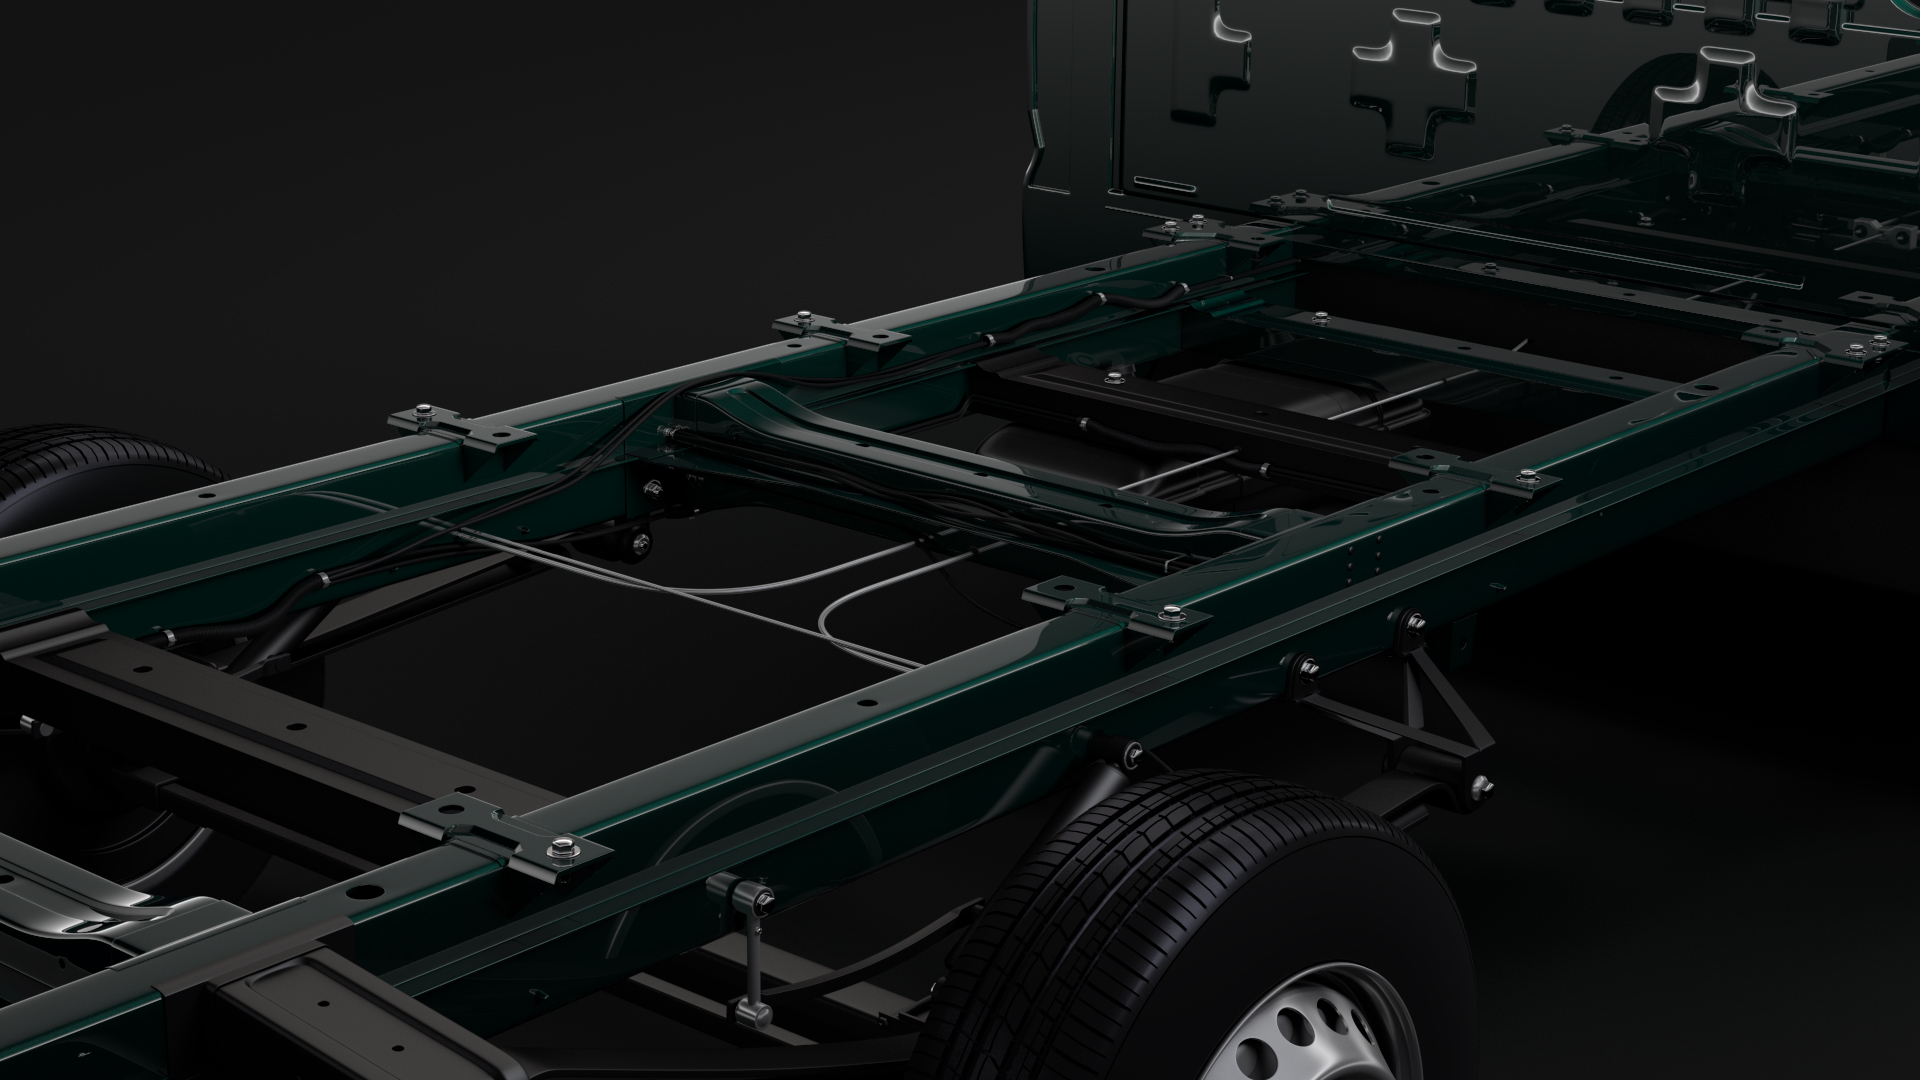 wv crafter chassis single-cab 2017 3d model max fbx c4d lwo ma mb hrc xsi obj 275094